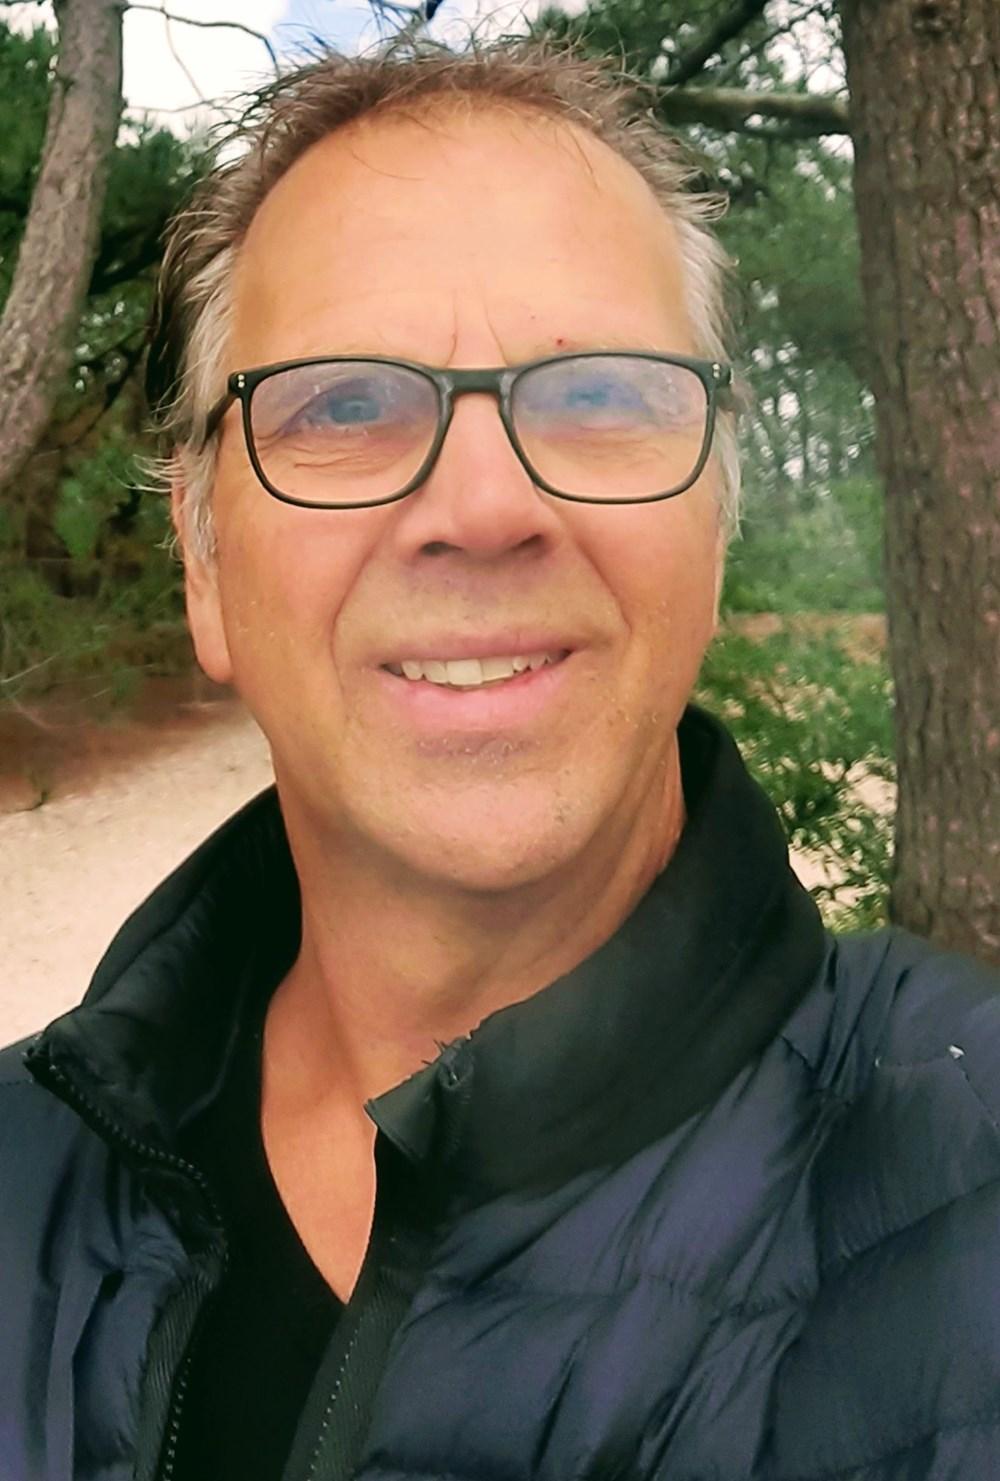 Bert_Schiphorst_20210306.jpg